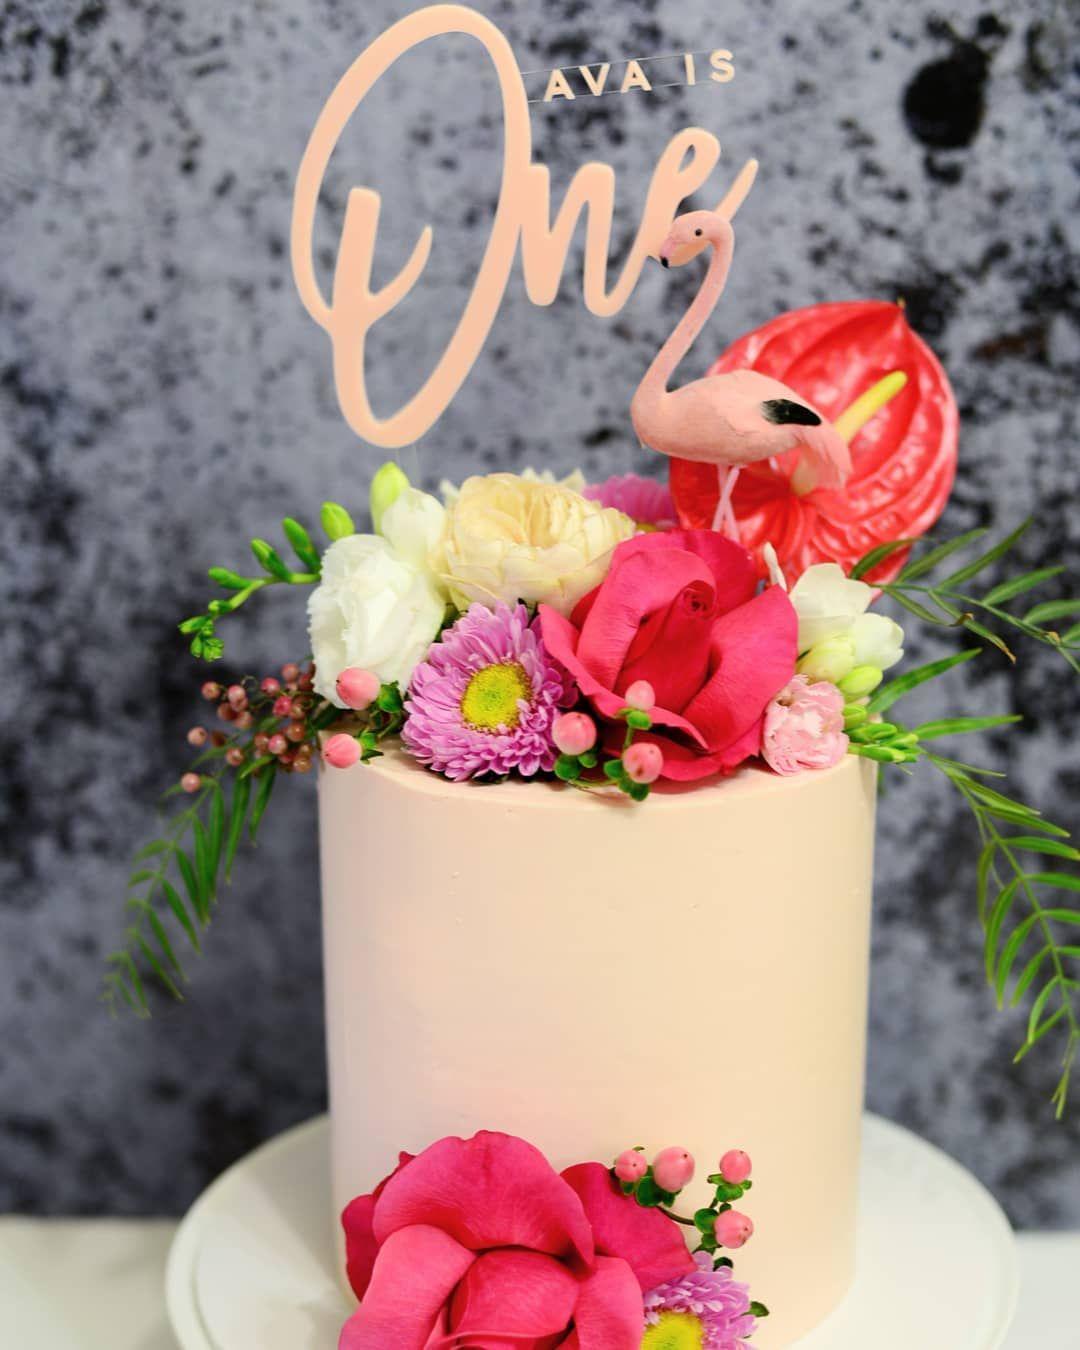 Flamingo cake for avas first birthday cake topper